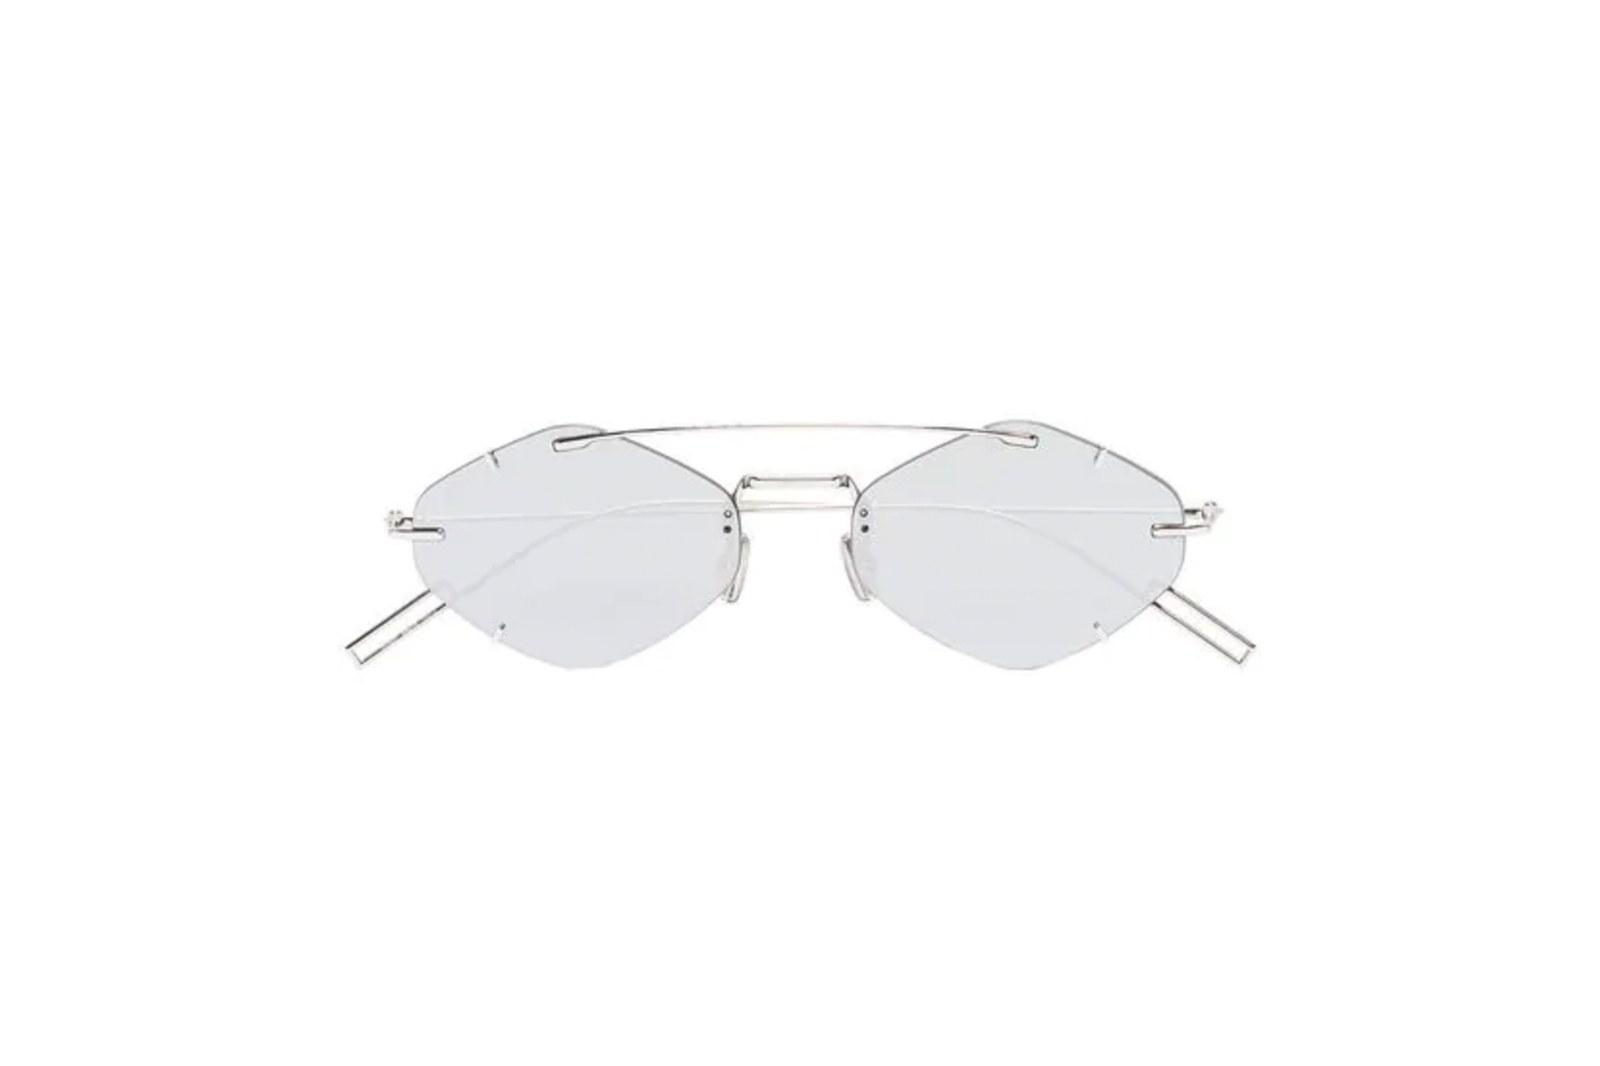 Kính Dior Eyewear silver tone Inclusion geometric sunglasses